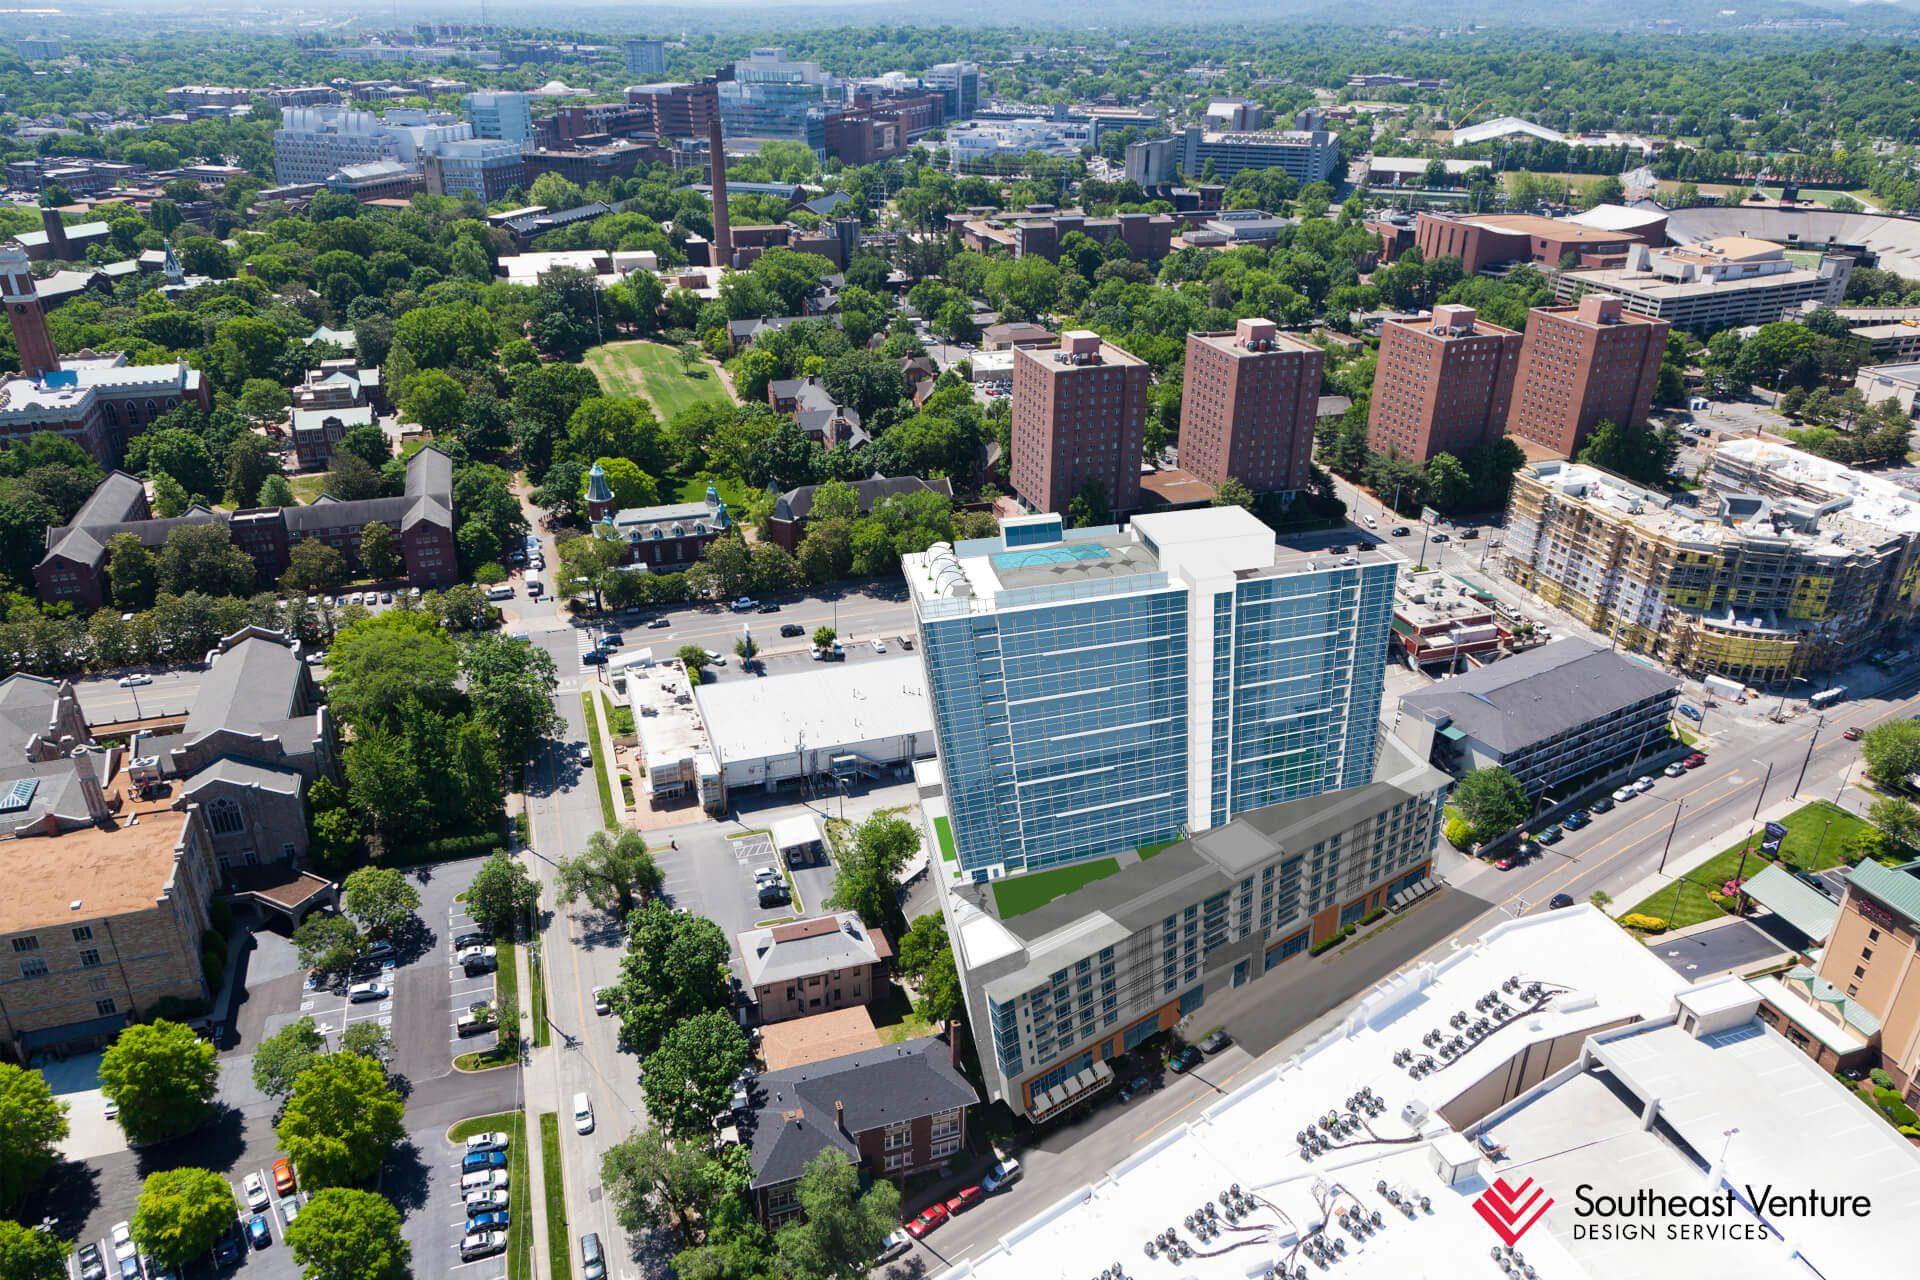 Elliston aerial perspective